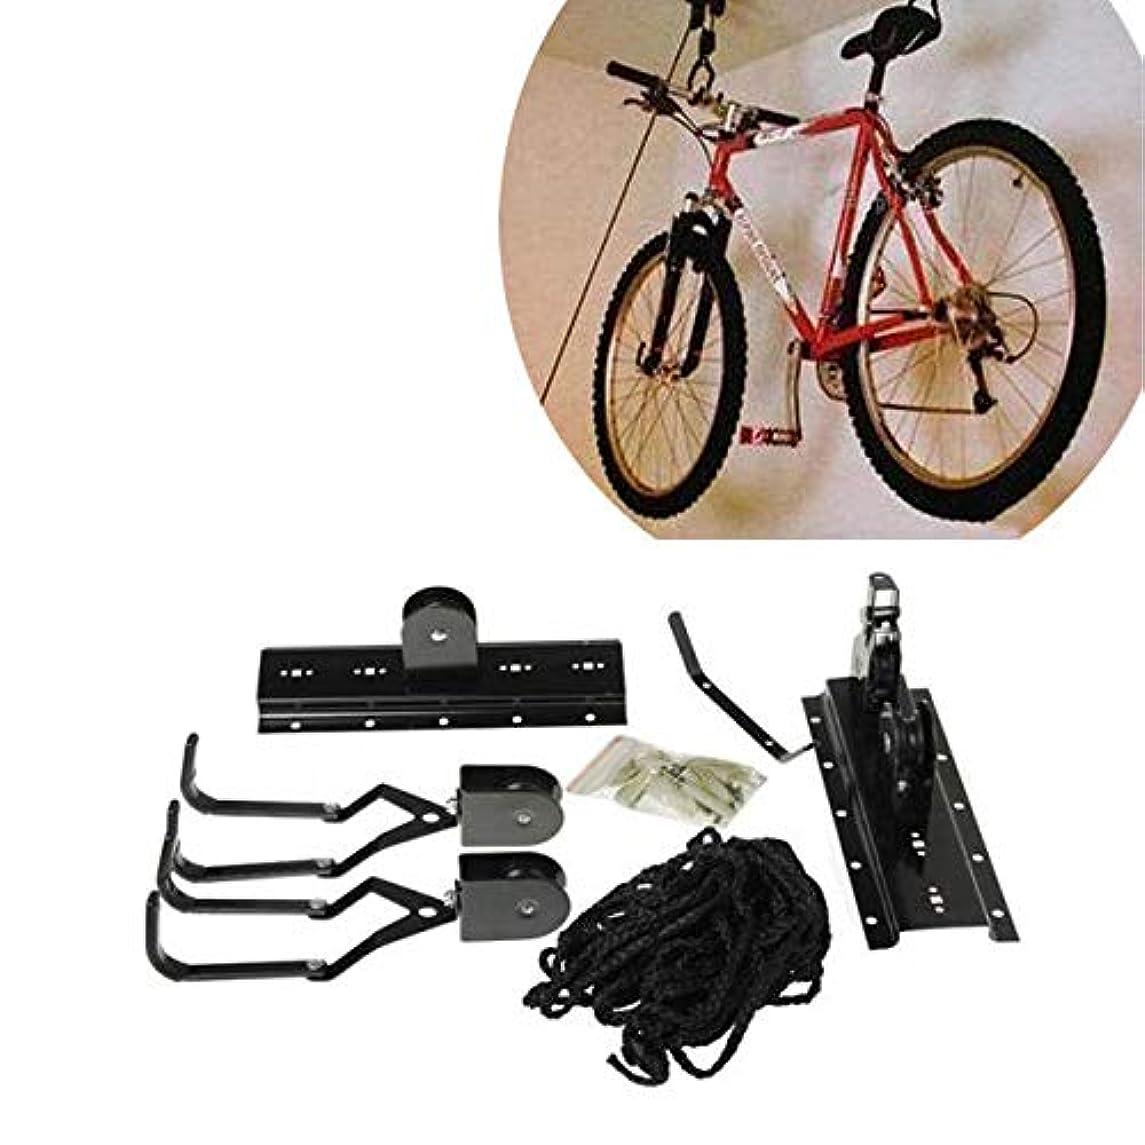 Bicycle Shelf Storage Rack Mount Hanger Hook Garage Wall Bike Holder Racks House Bicycle Wall Mounted Stands - Car Racks